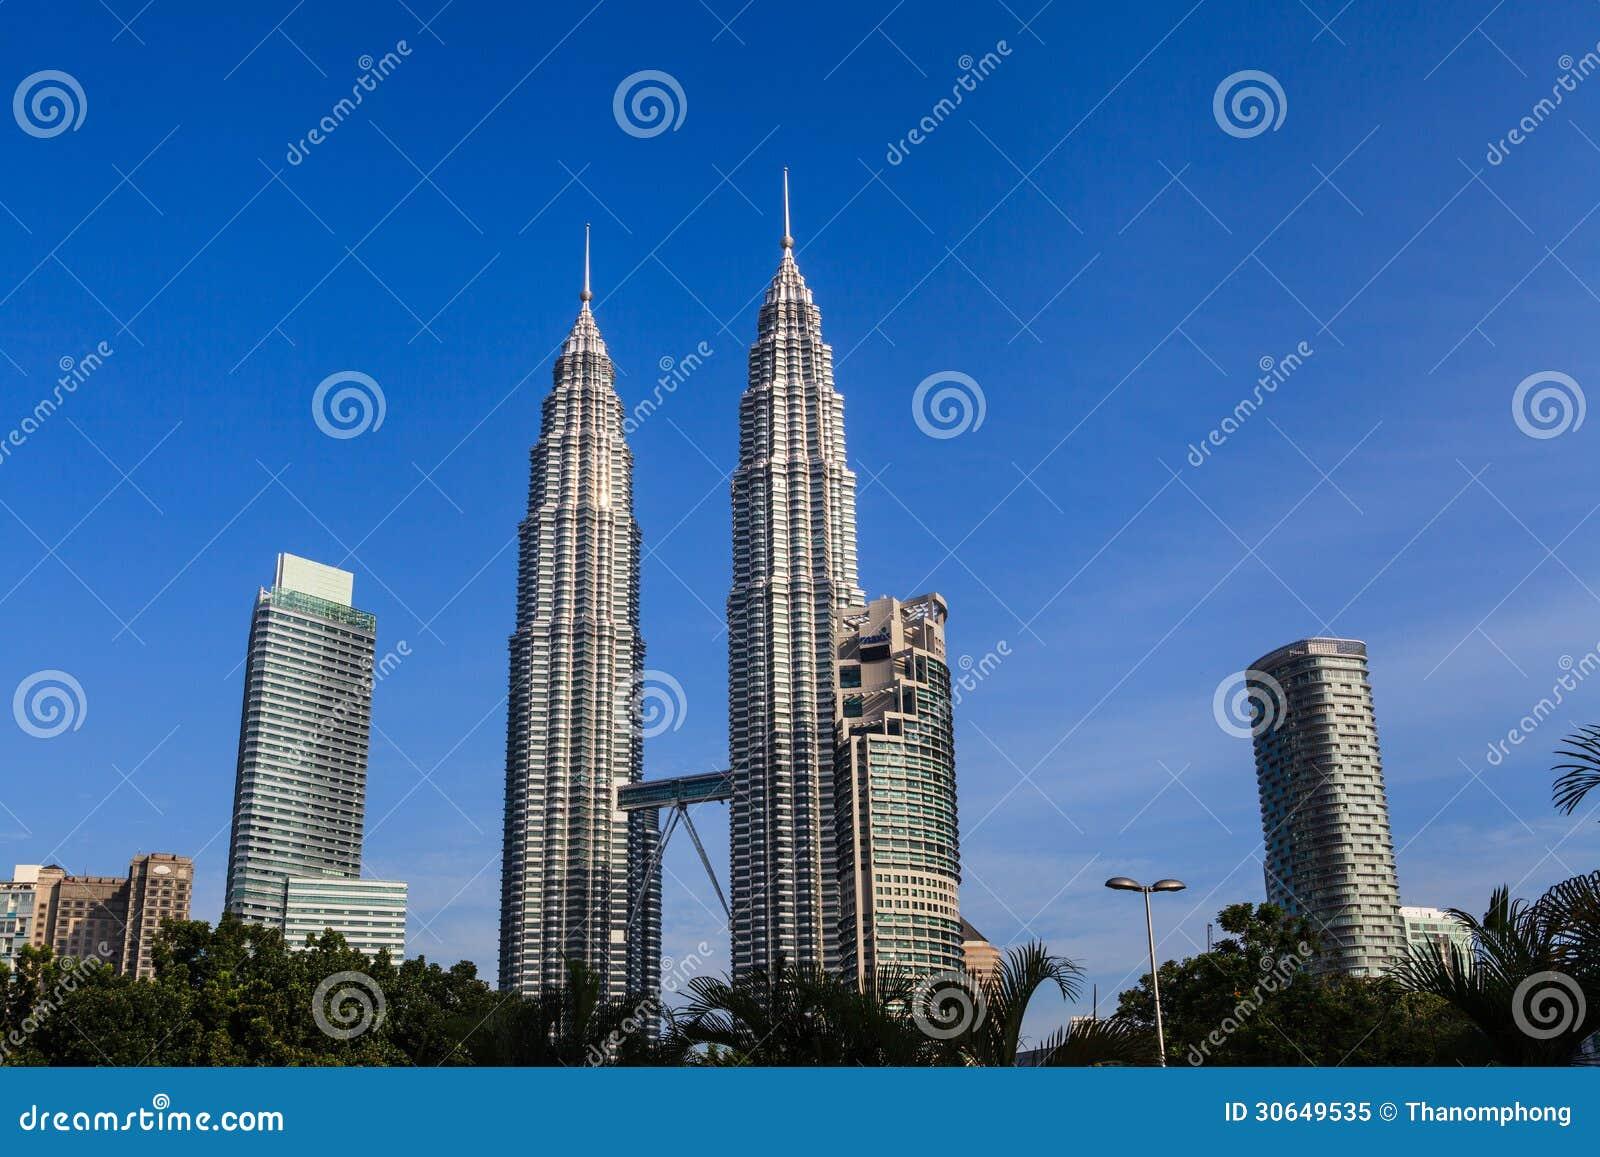 The Petronas Twin Towers Royalty Free Stock Photo - Image